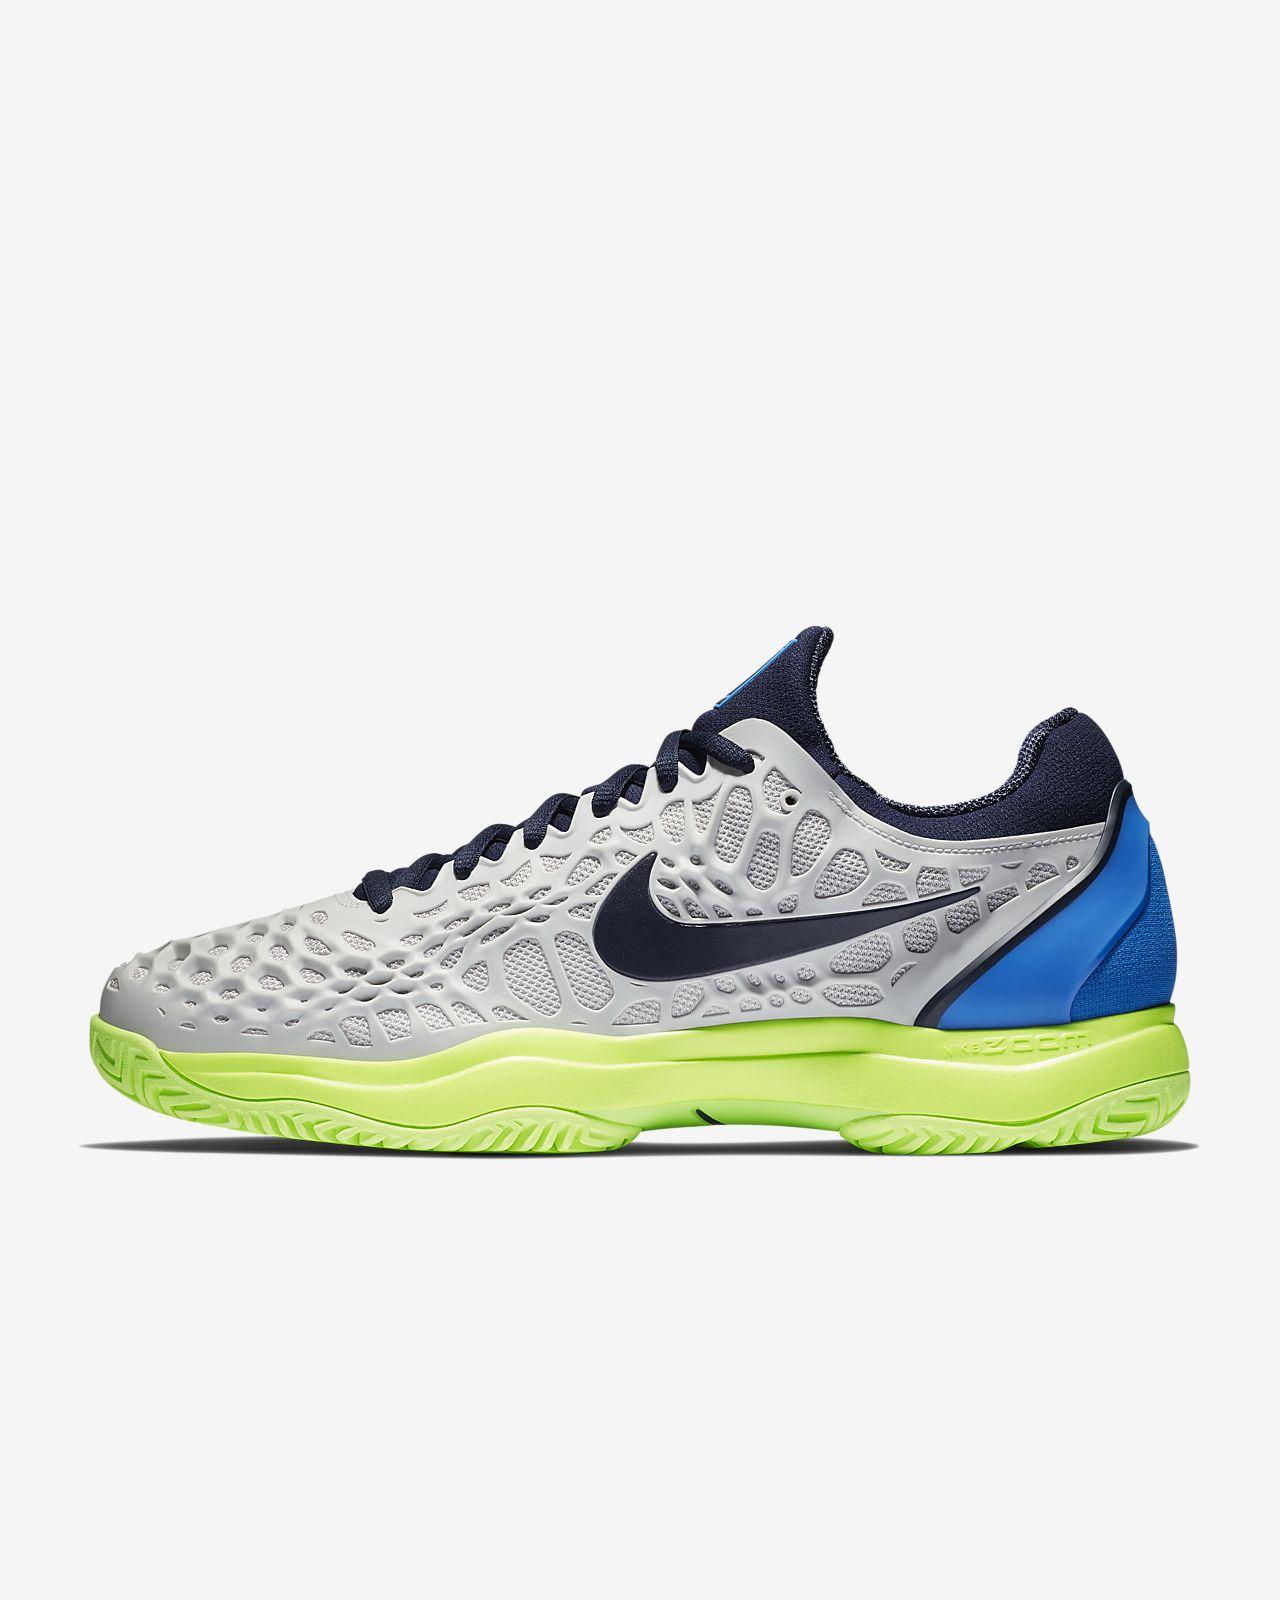 a7a290d93ad Pánská tenisová bota NikeCourt Zoom Cage 3 na tvrdý povrch. Nike.com CZ